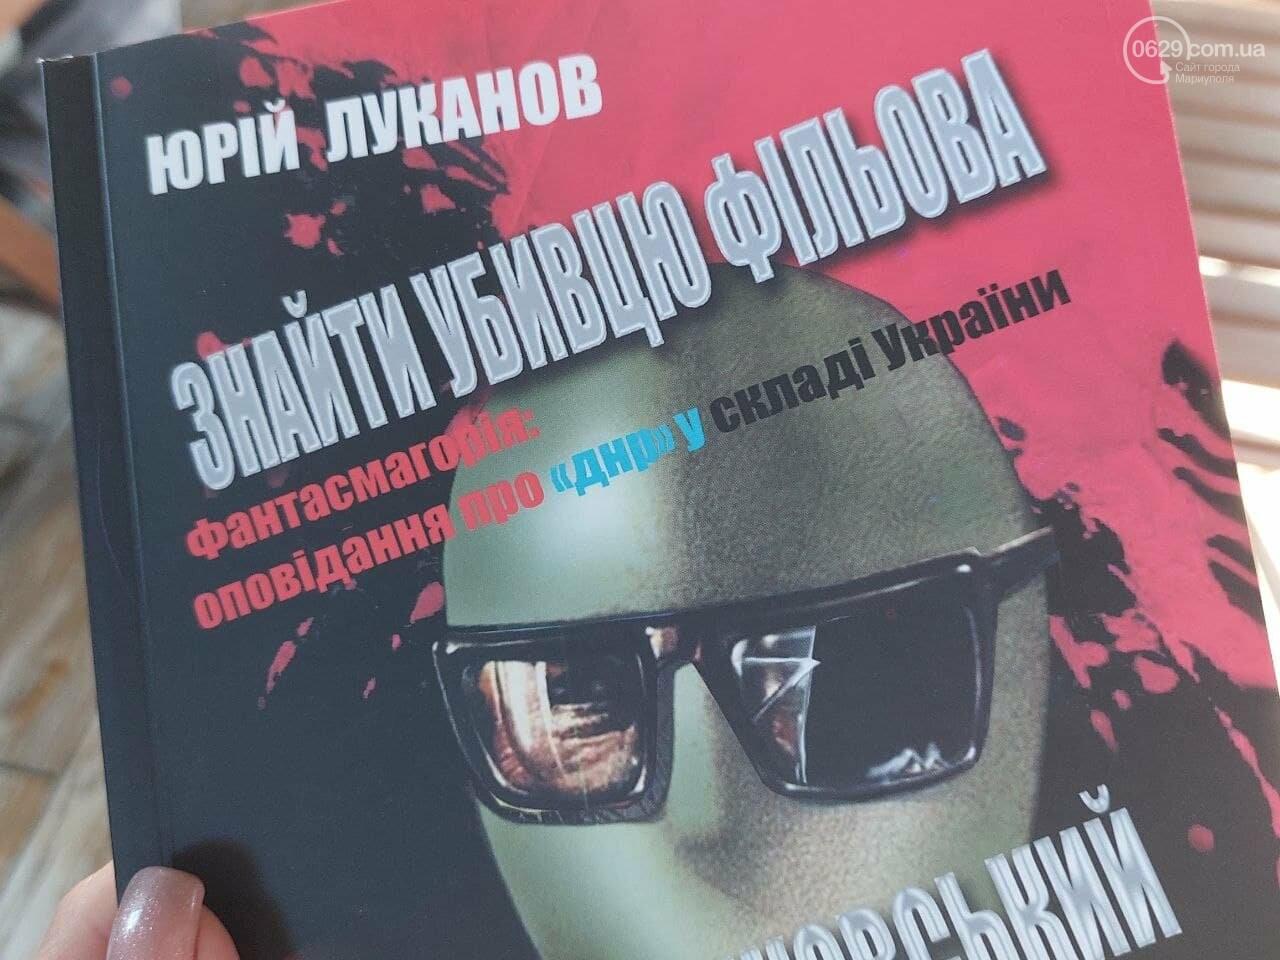 В Мариуполе презентовали книгу про воплотившуюся мечту Путина, - ФОТО, фото-1